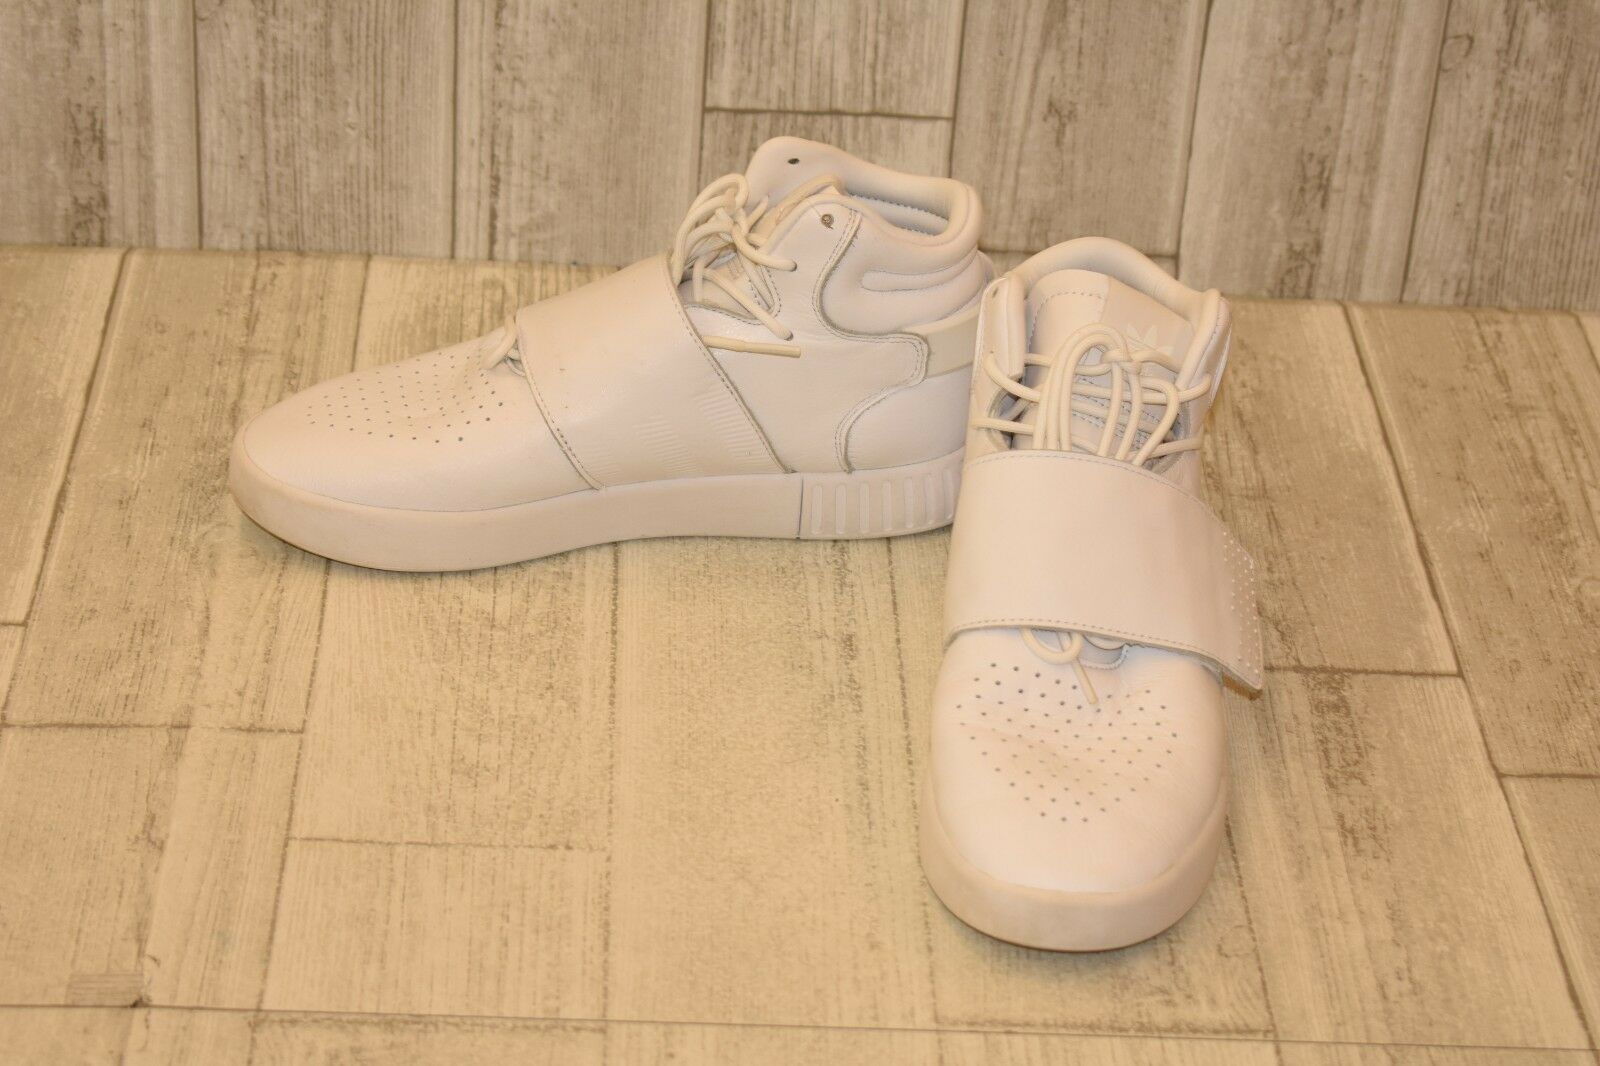 Adidas Originals Tubular Invader Strap High Top Sneaker, Men's Size 8.5, White